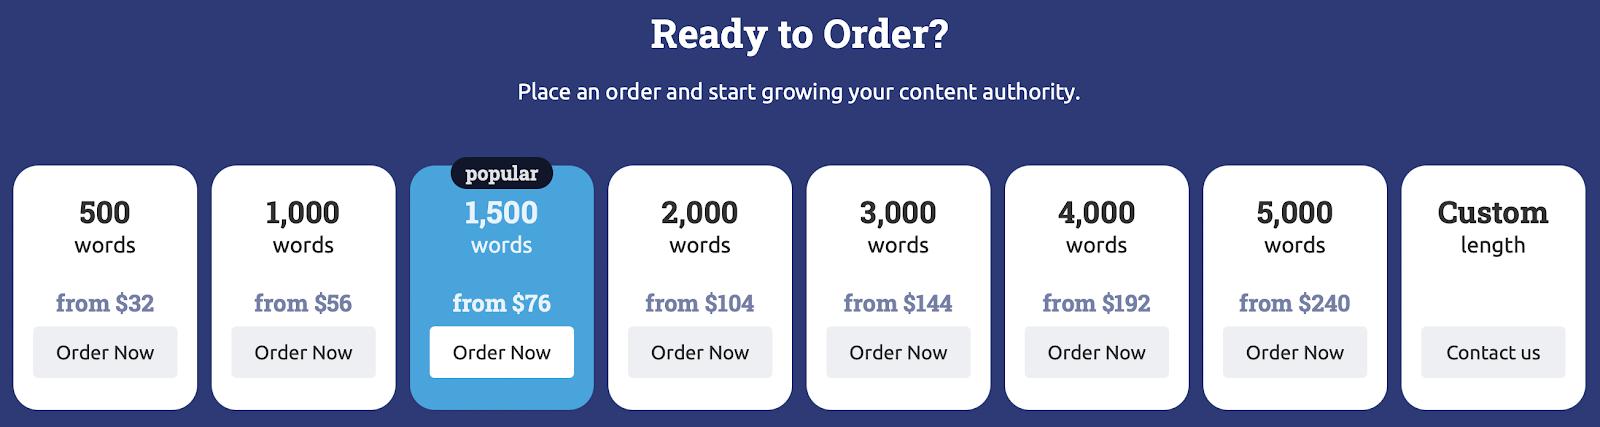 content authority plans